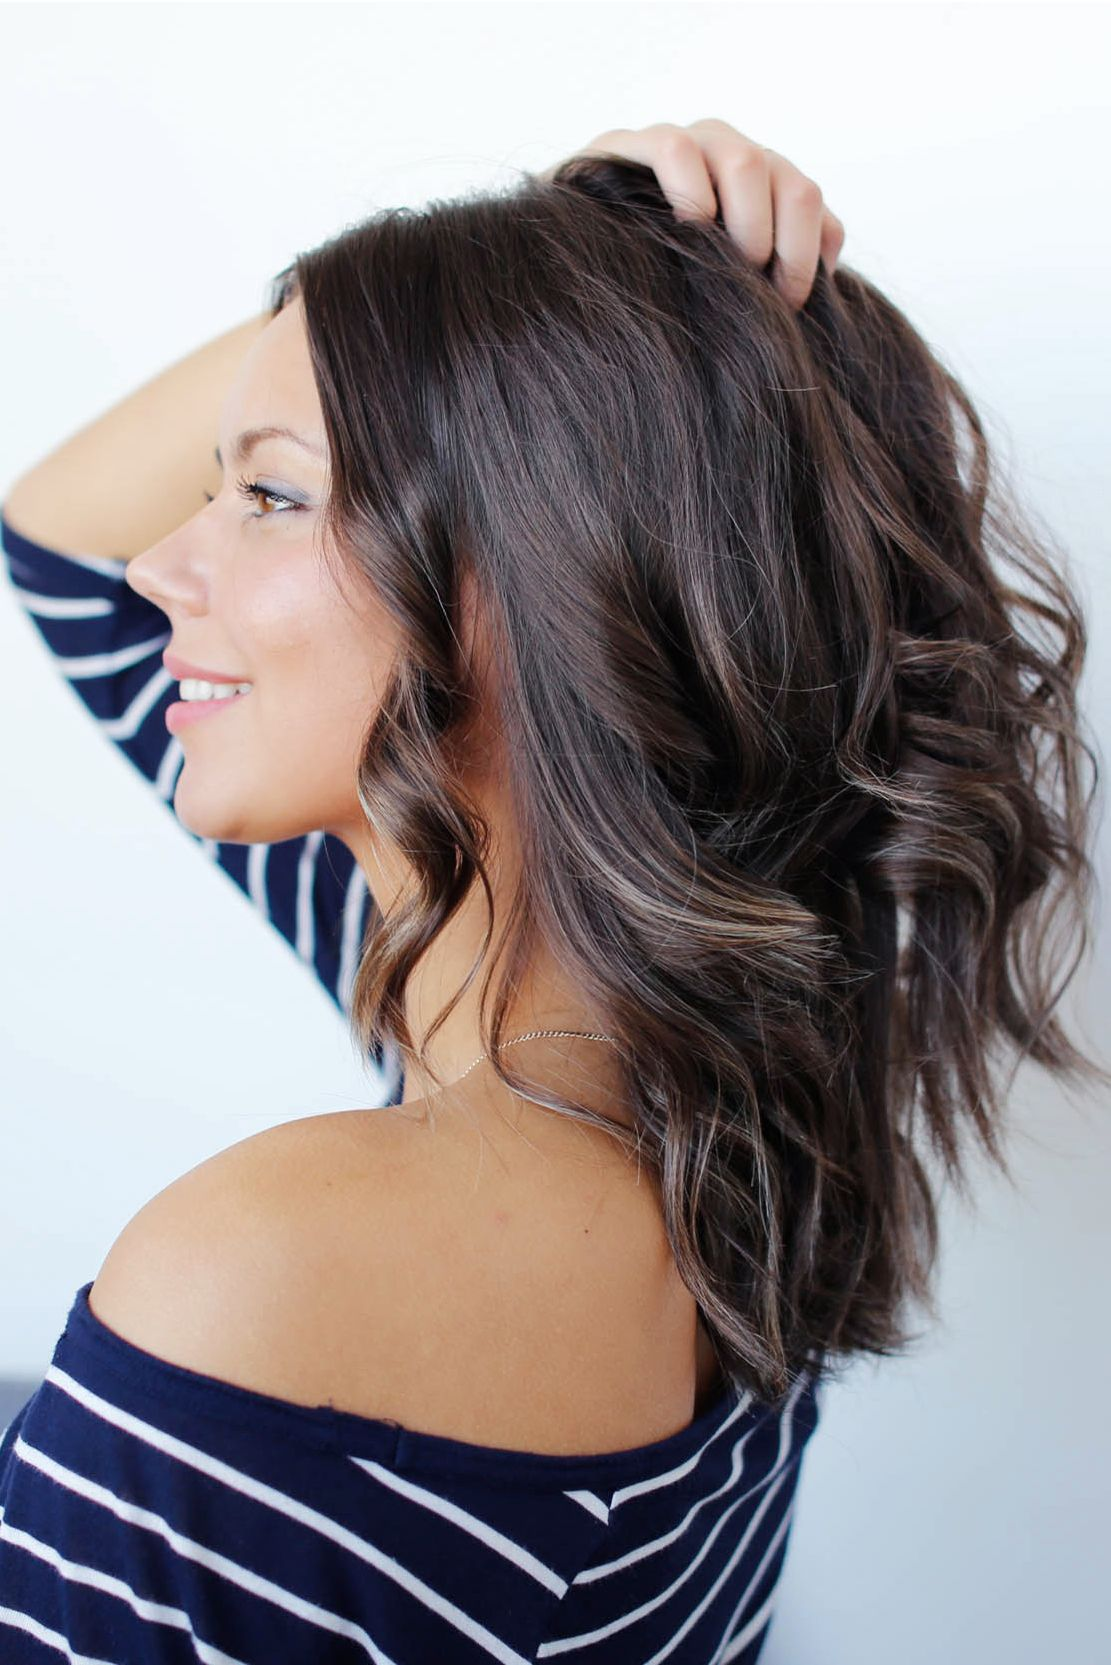 How To Curl Short Hair How to curl short hair, Short